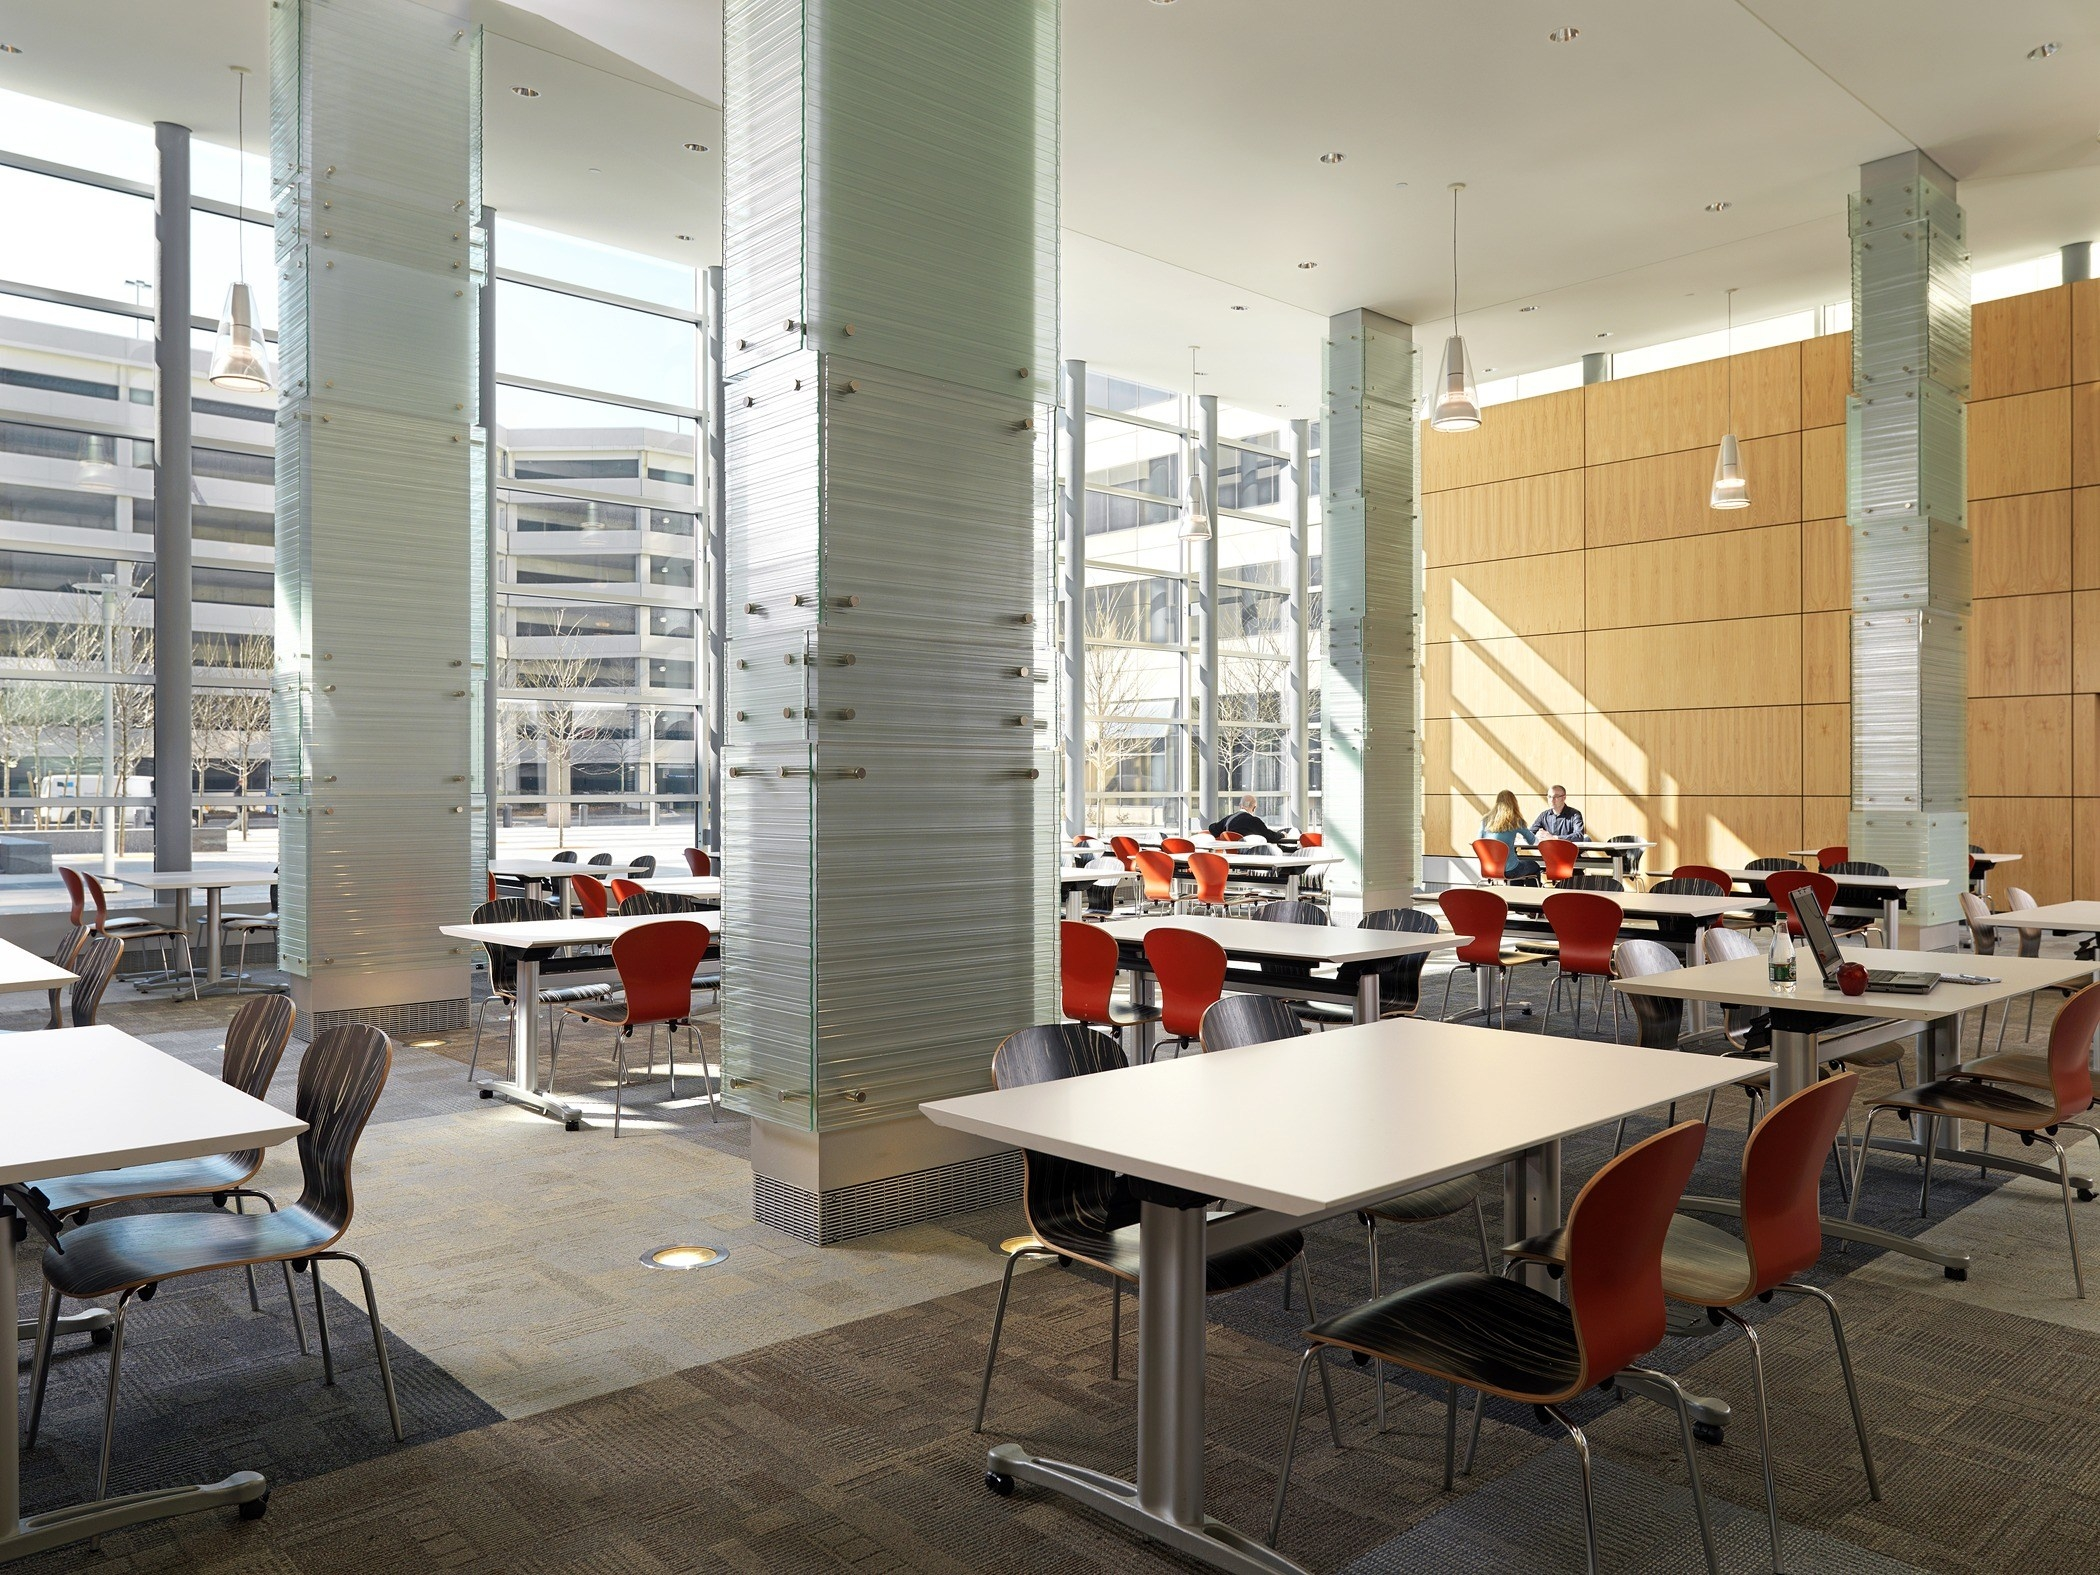 Renovated Cafeteria at Draper Labs